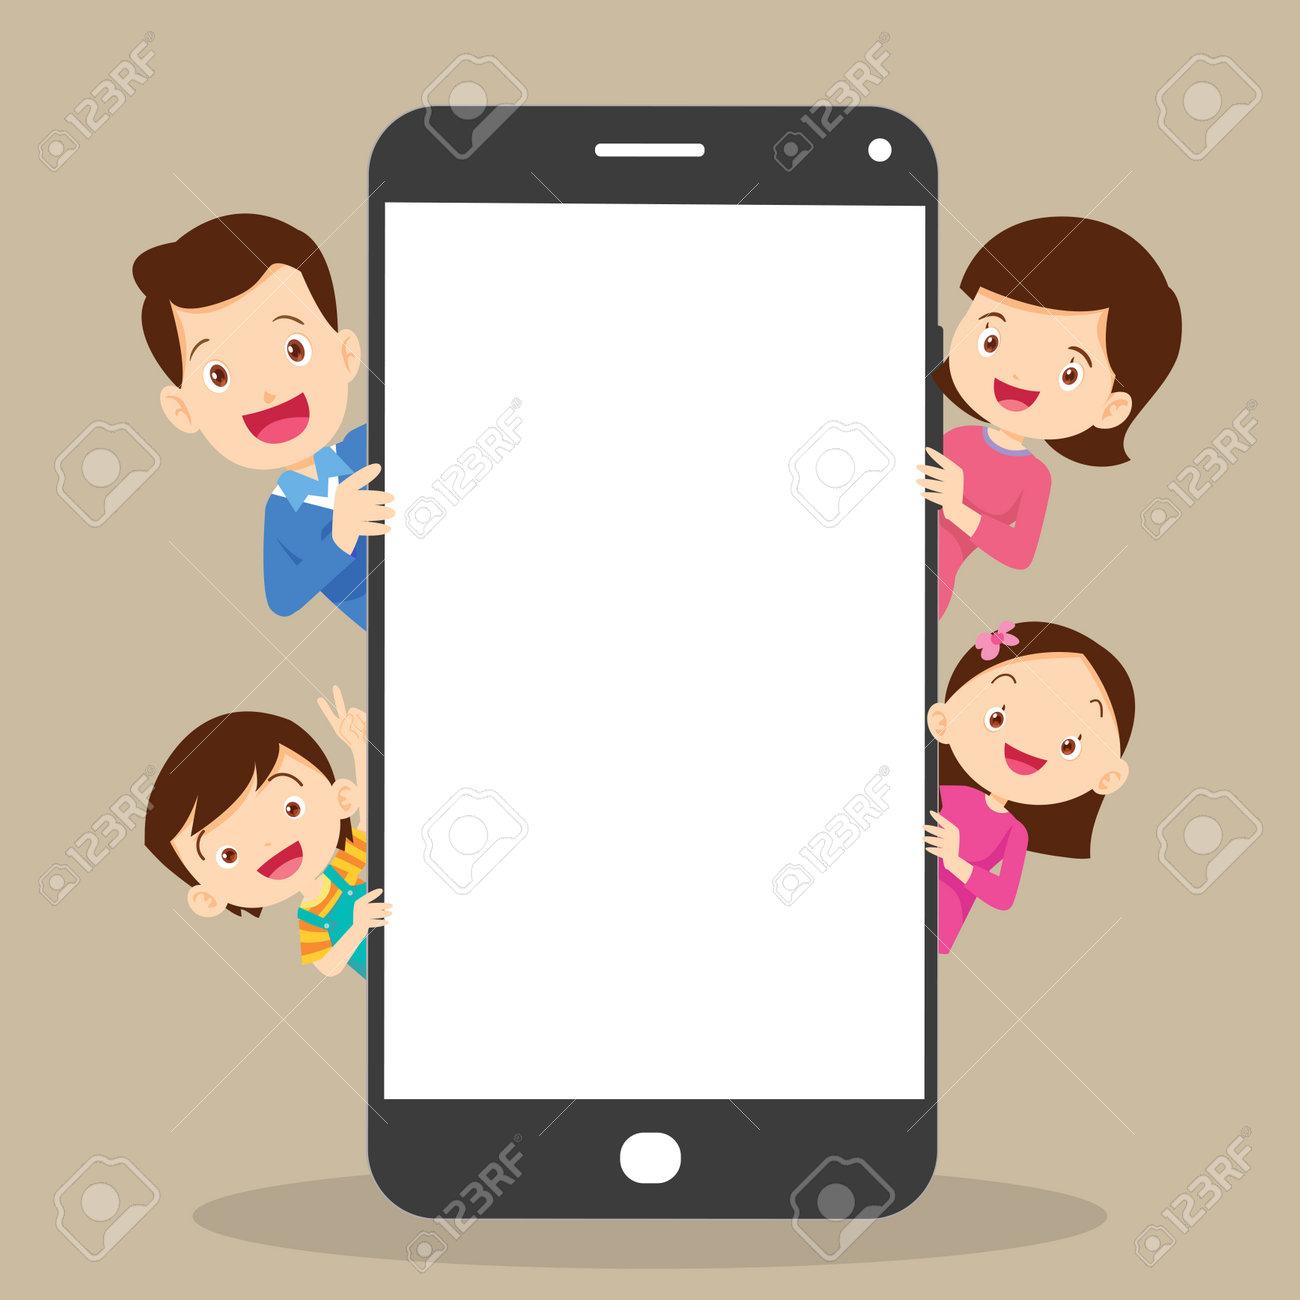 family peeking behind blank smartphone.family hiding behind smartphone. - 169061390